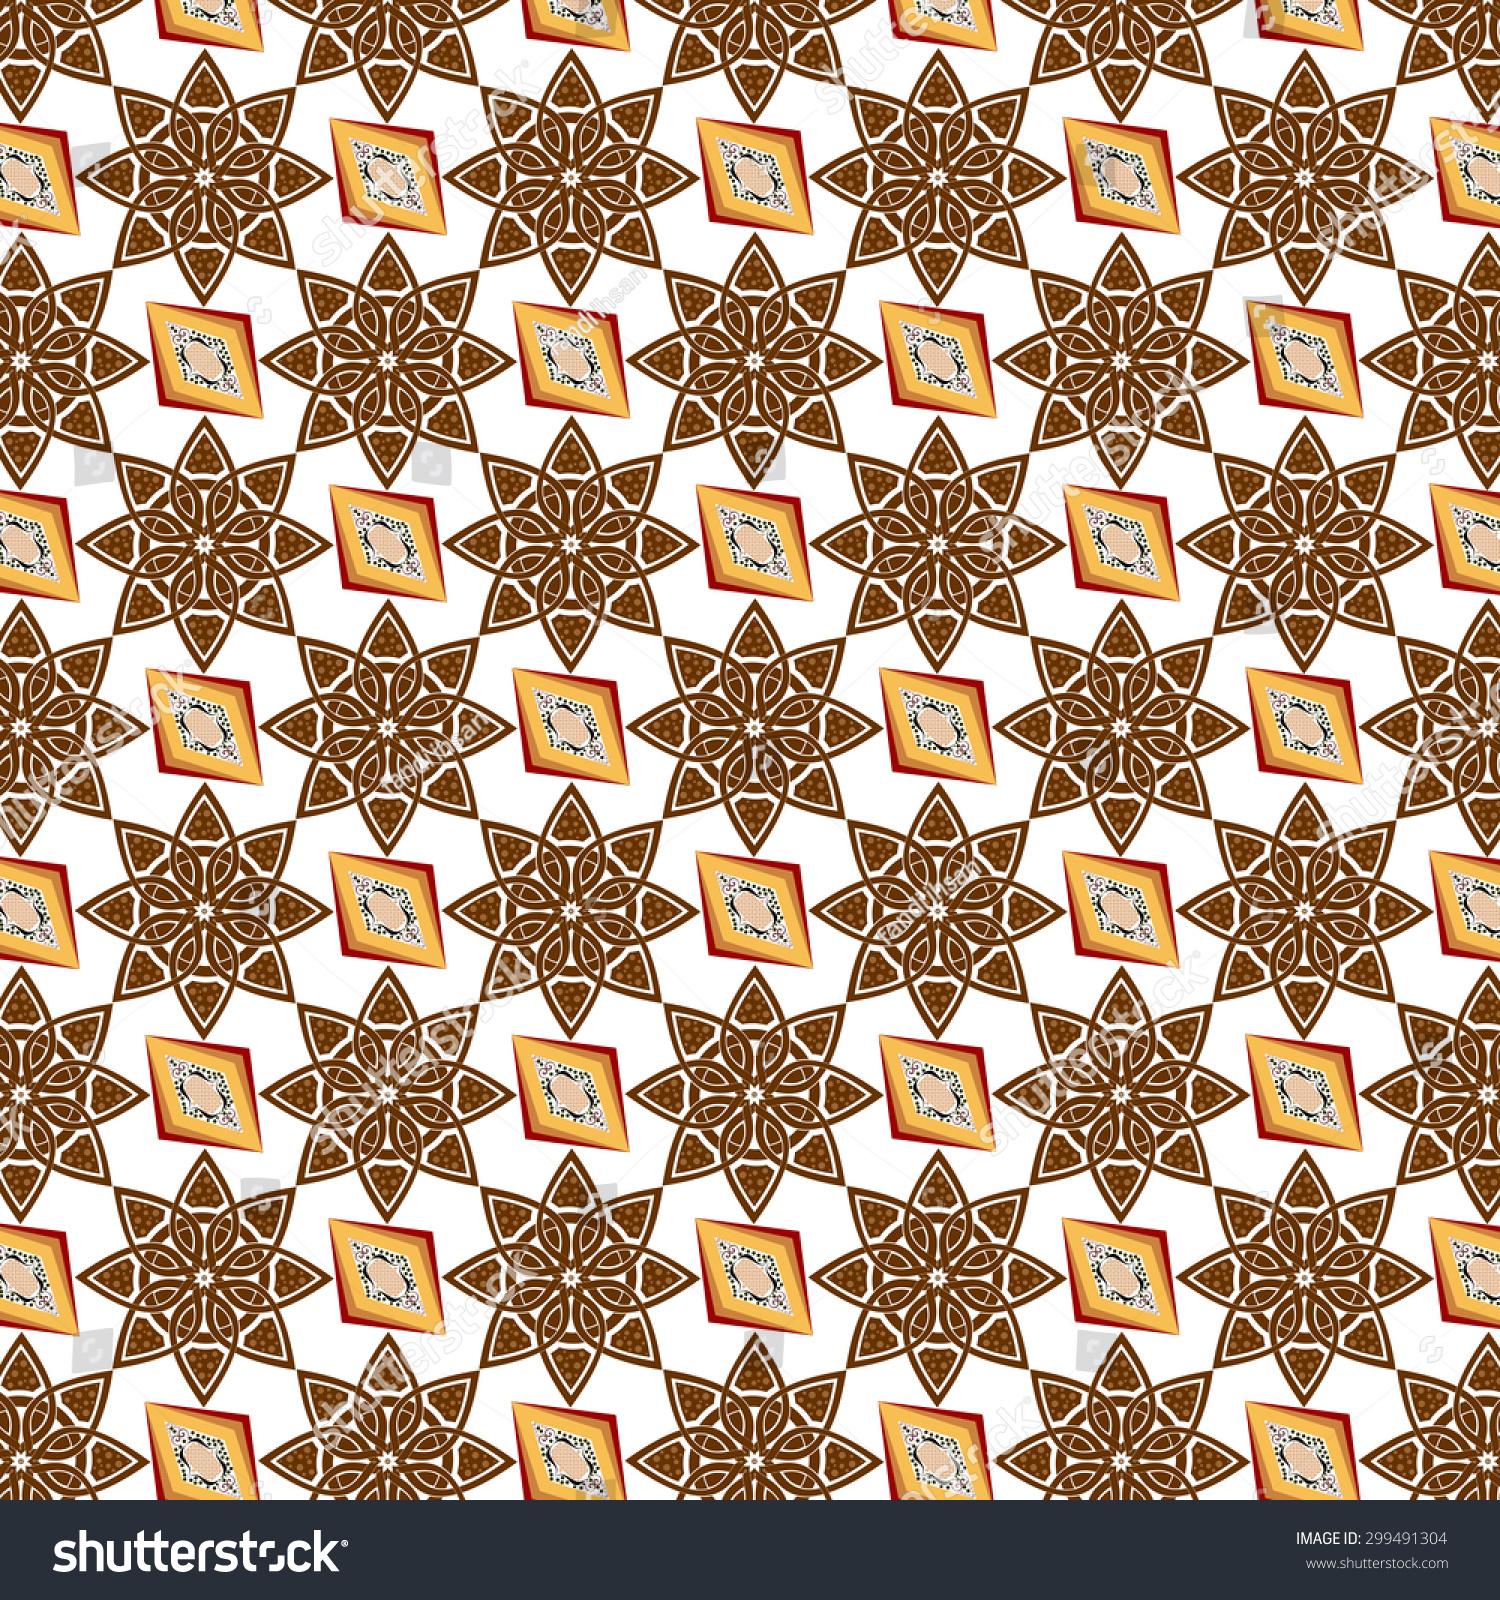 batik background vectors - photo #25